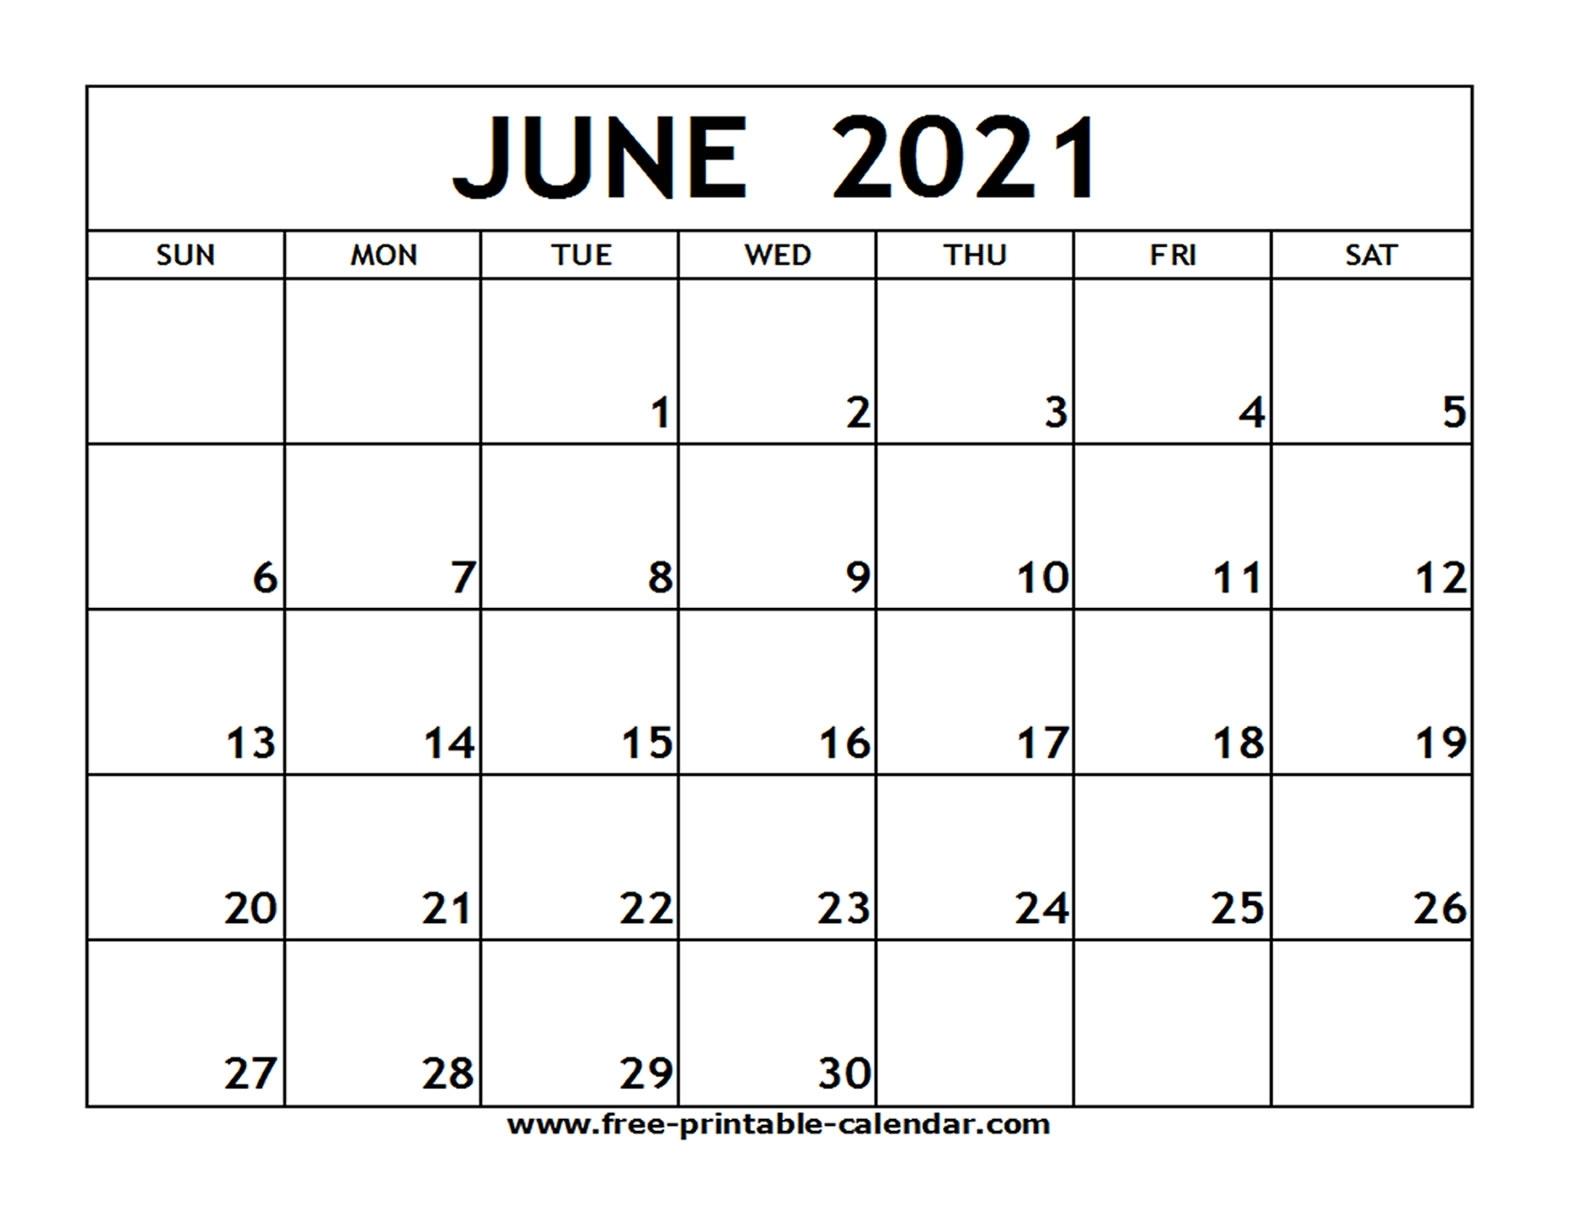 June 2021 Printable Calendar - Free-Printable-Calendar